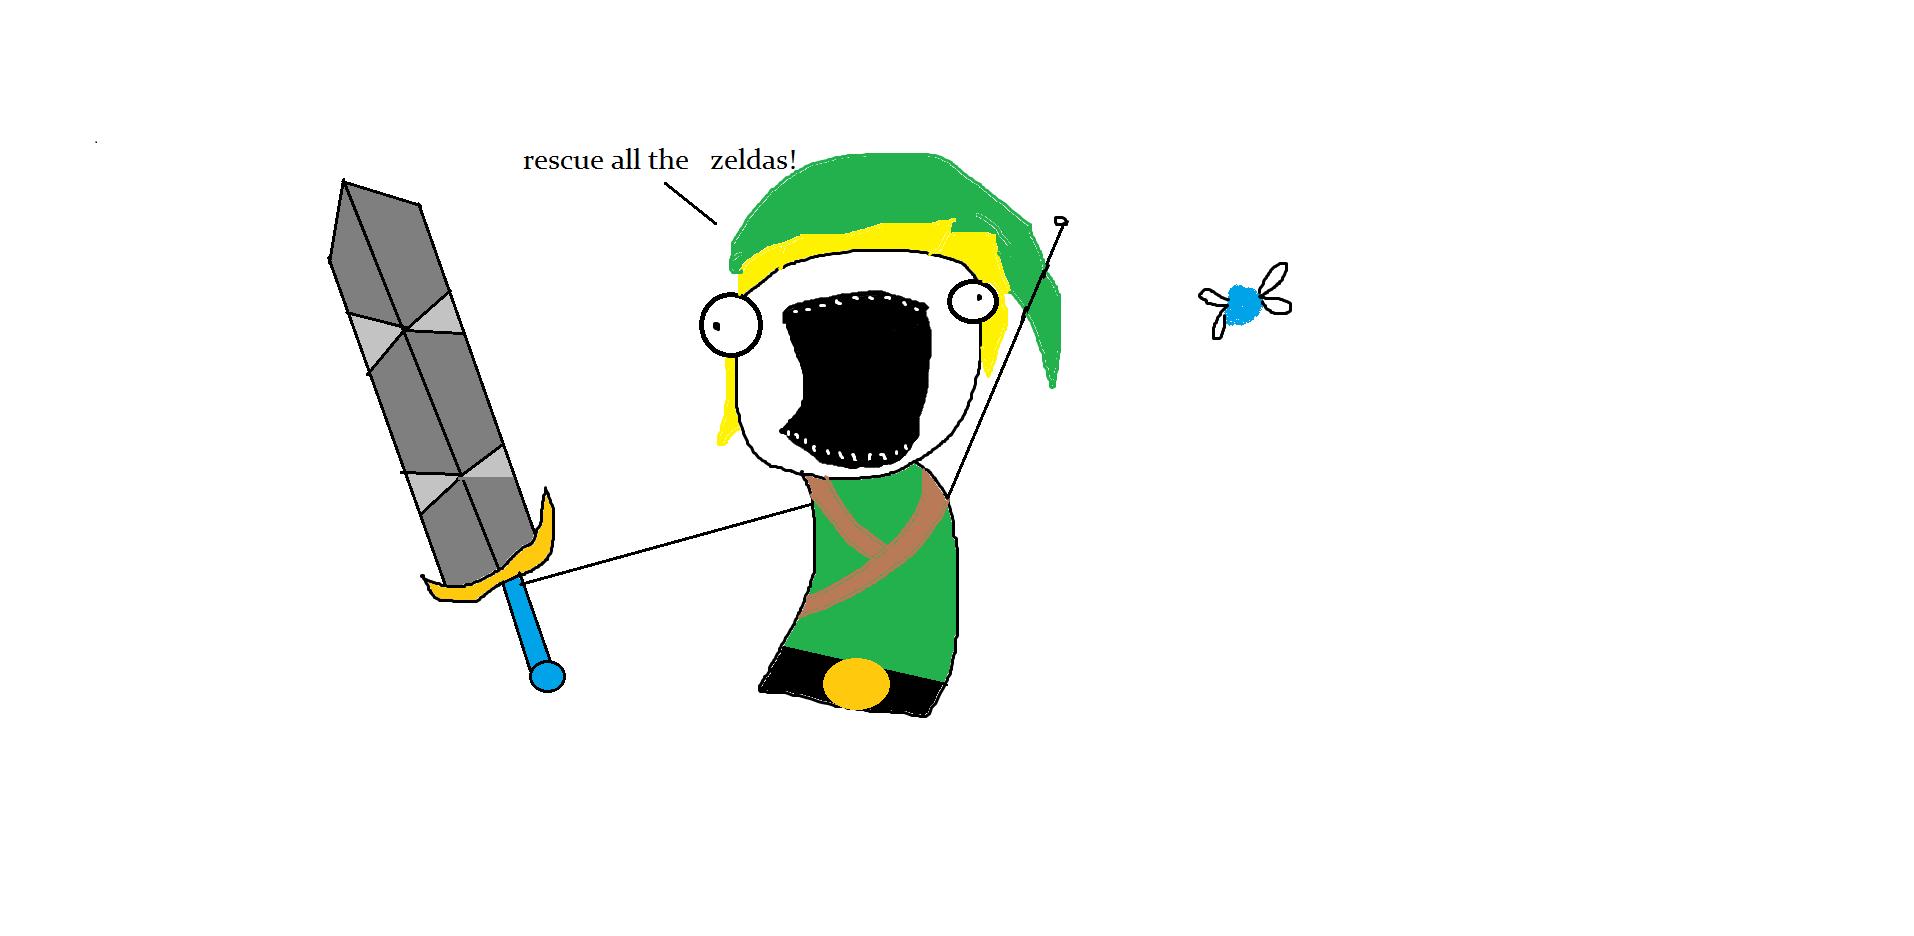 Zelda Rescue